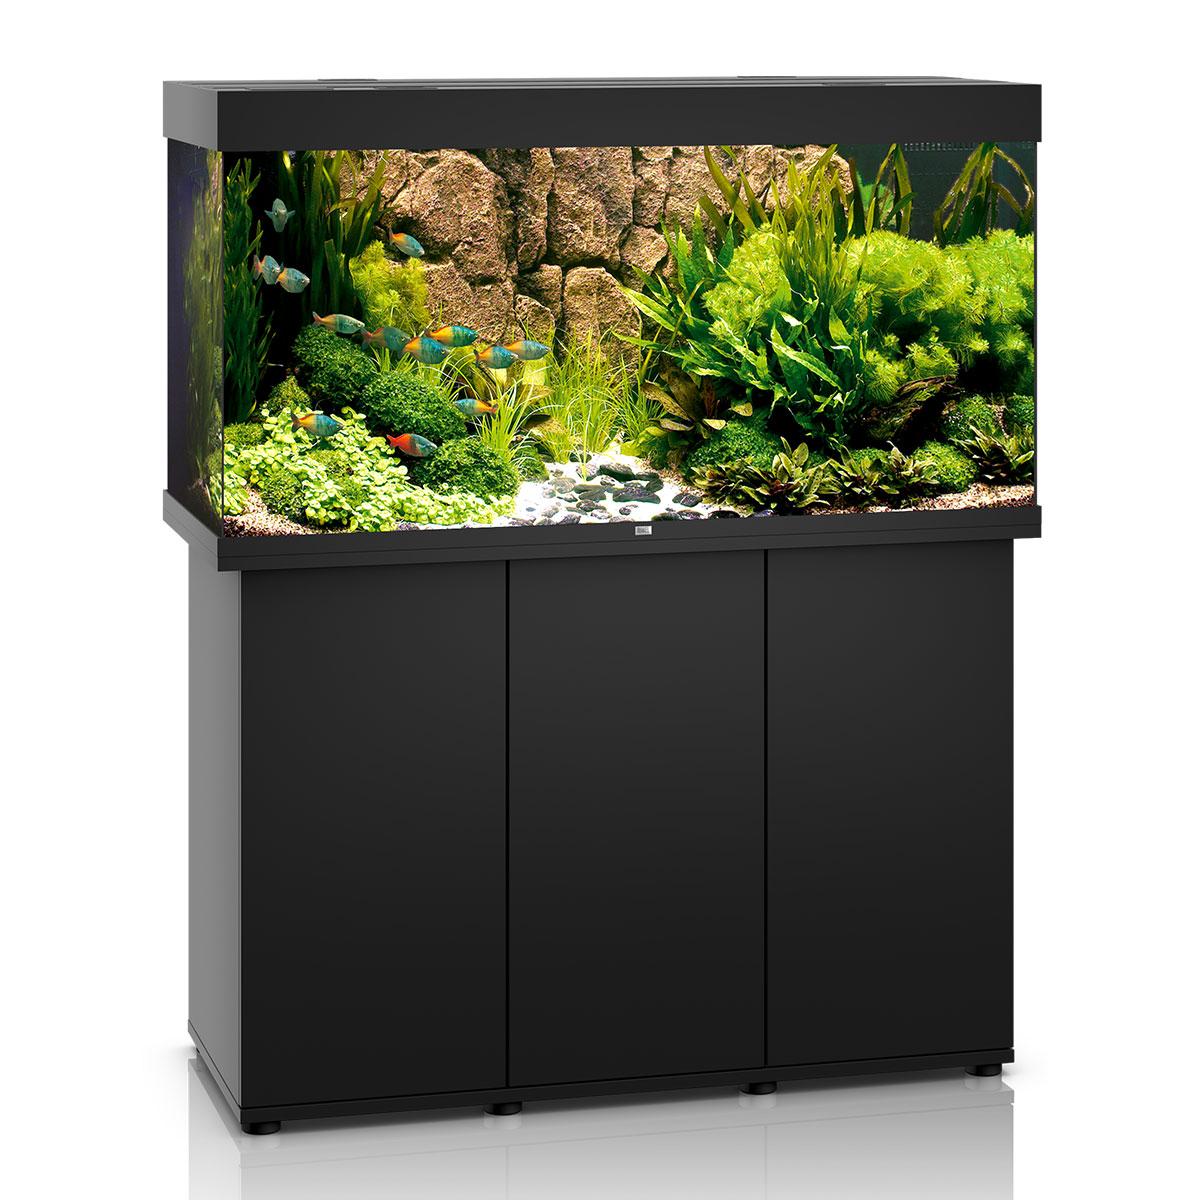 juwel rio 350 led komplett aquarium mit unterschrank sbx. Black Bedroom Furniture Sets. Home Design Ideas